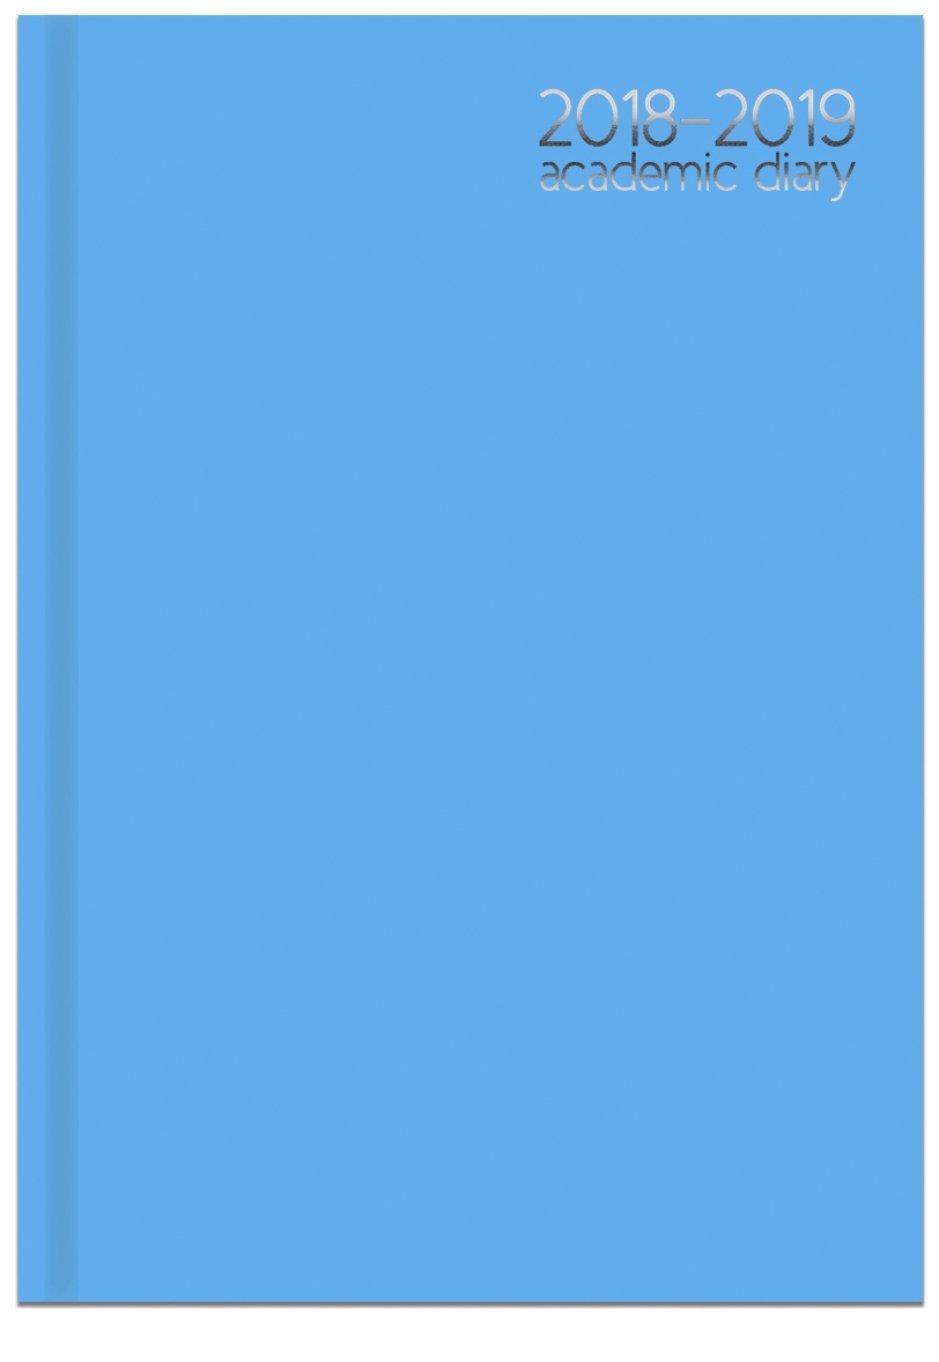 3887 Agenda tamaño A4, vista semanal, año académico 2018 ...